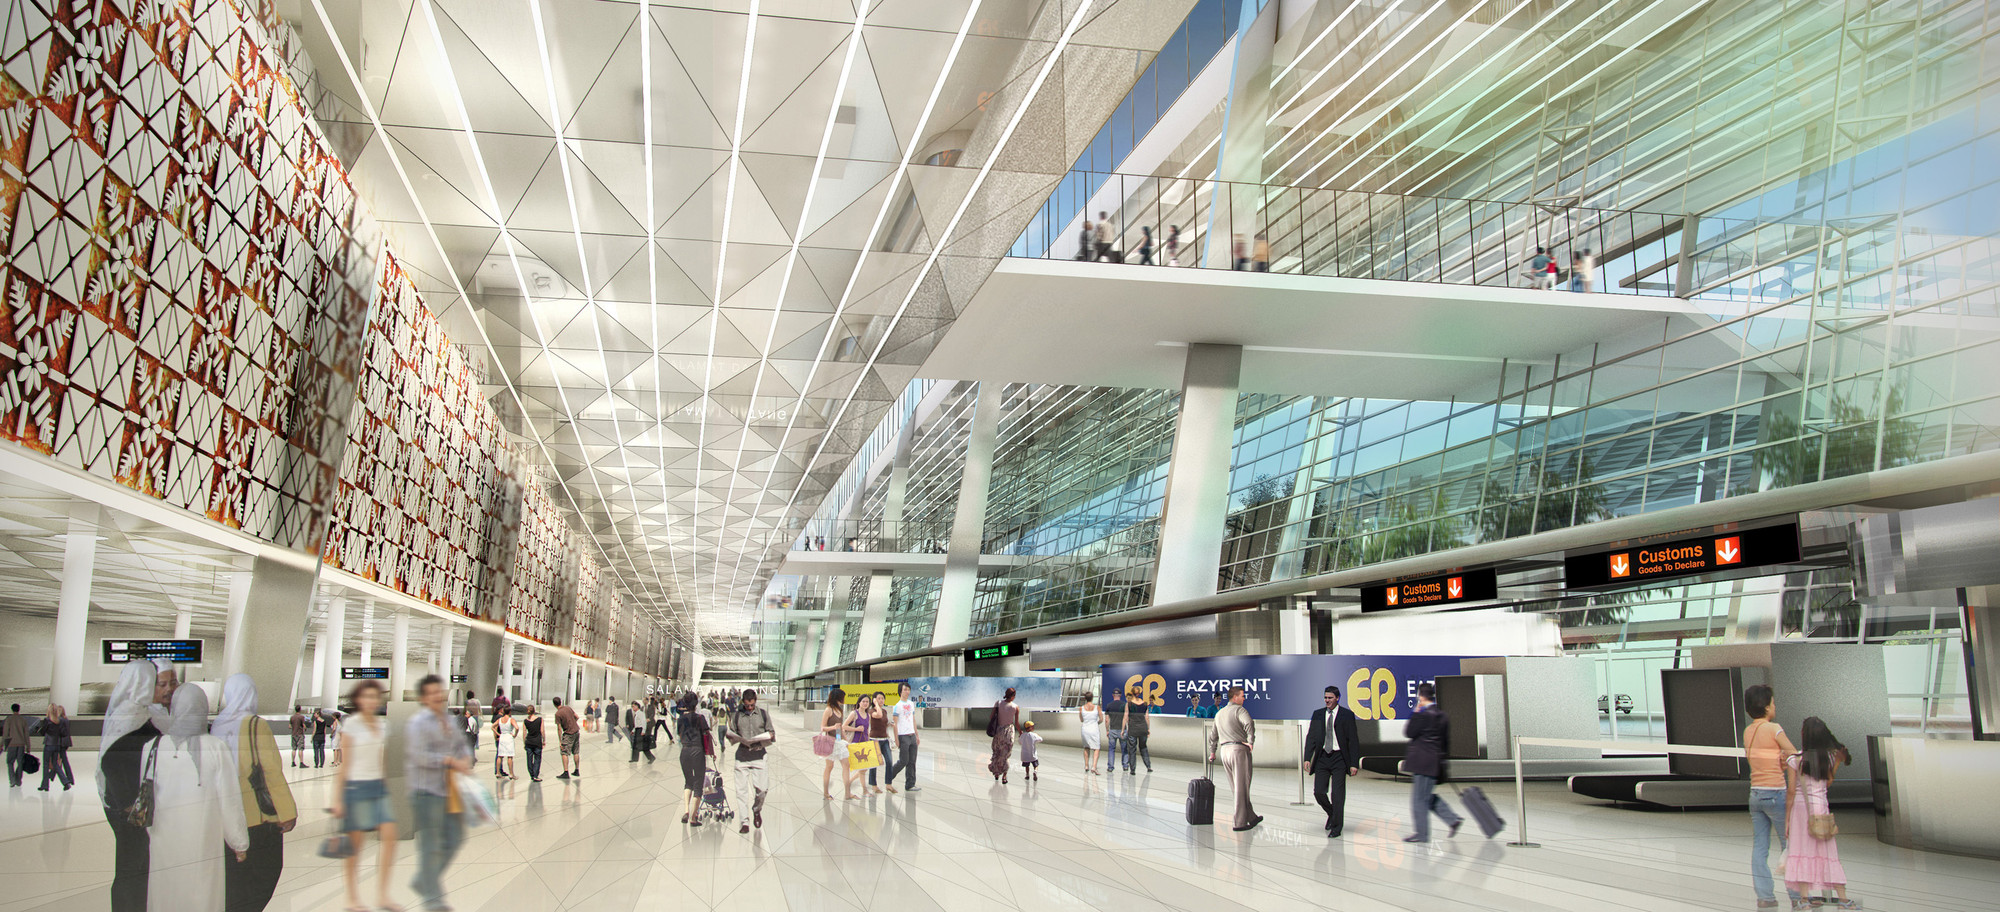 Gallery Soekarno Hatta International Airport Terminal 3 Winning Proposal Woodhead 3